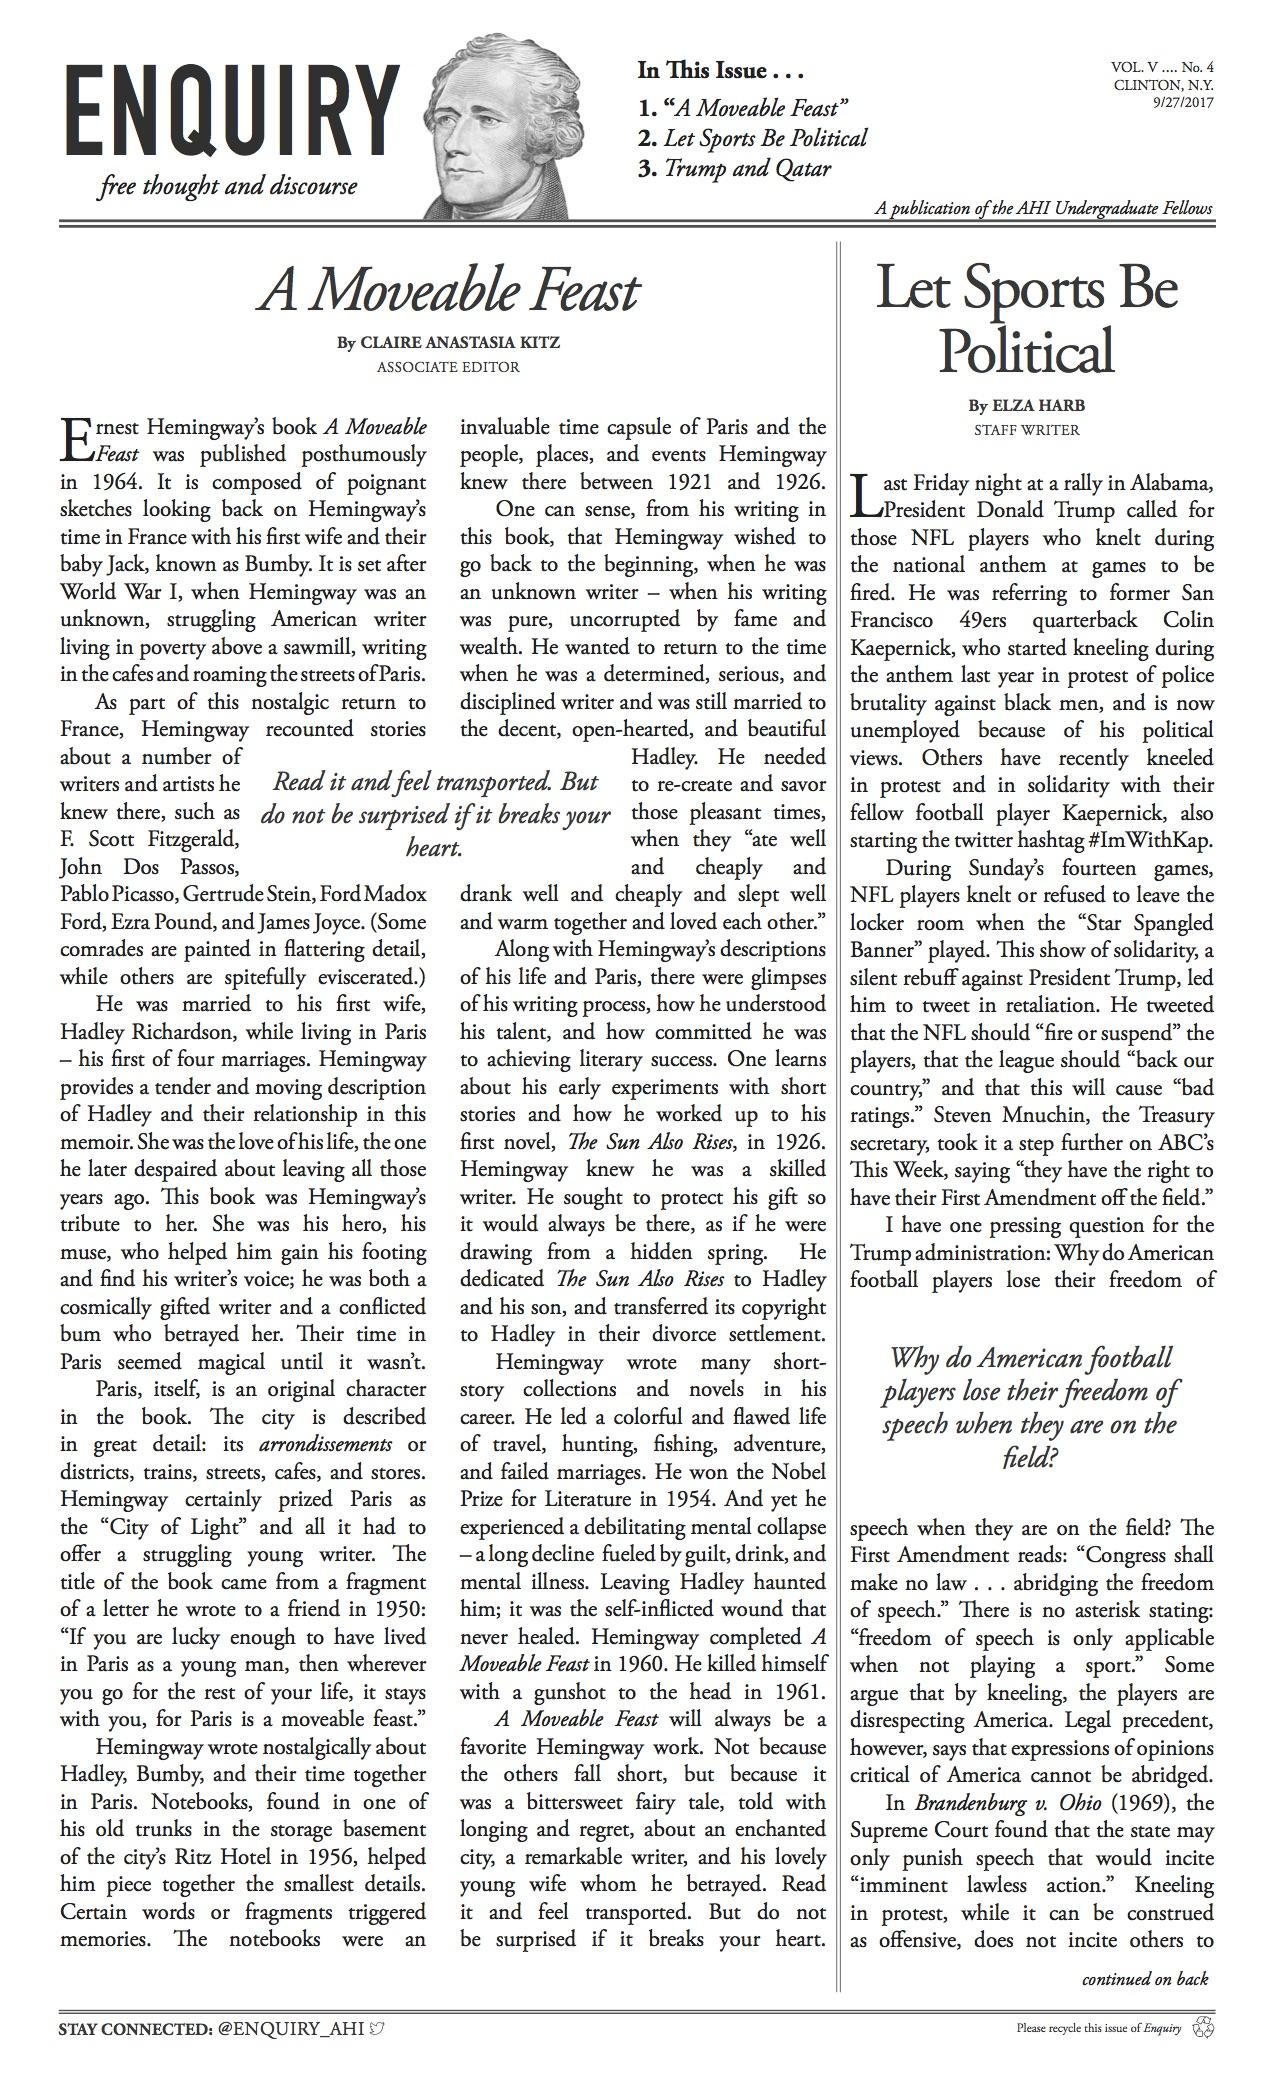 Enquiry Vol 5 No 4 front.jpg